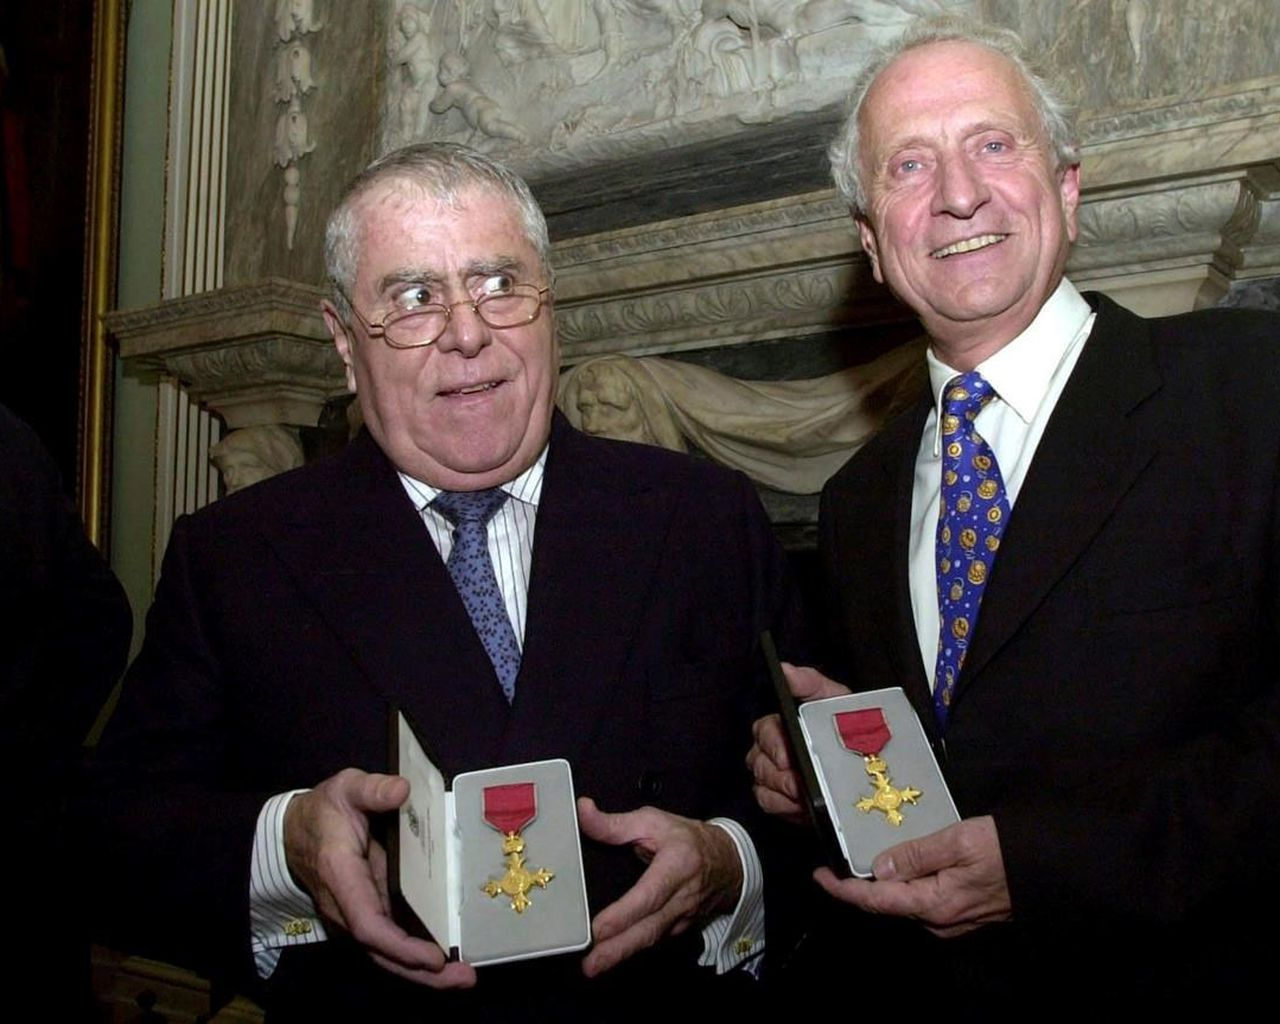 Albert Roux, Major Influence On Uk Dining Habits, Dies At 85 photo